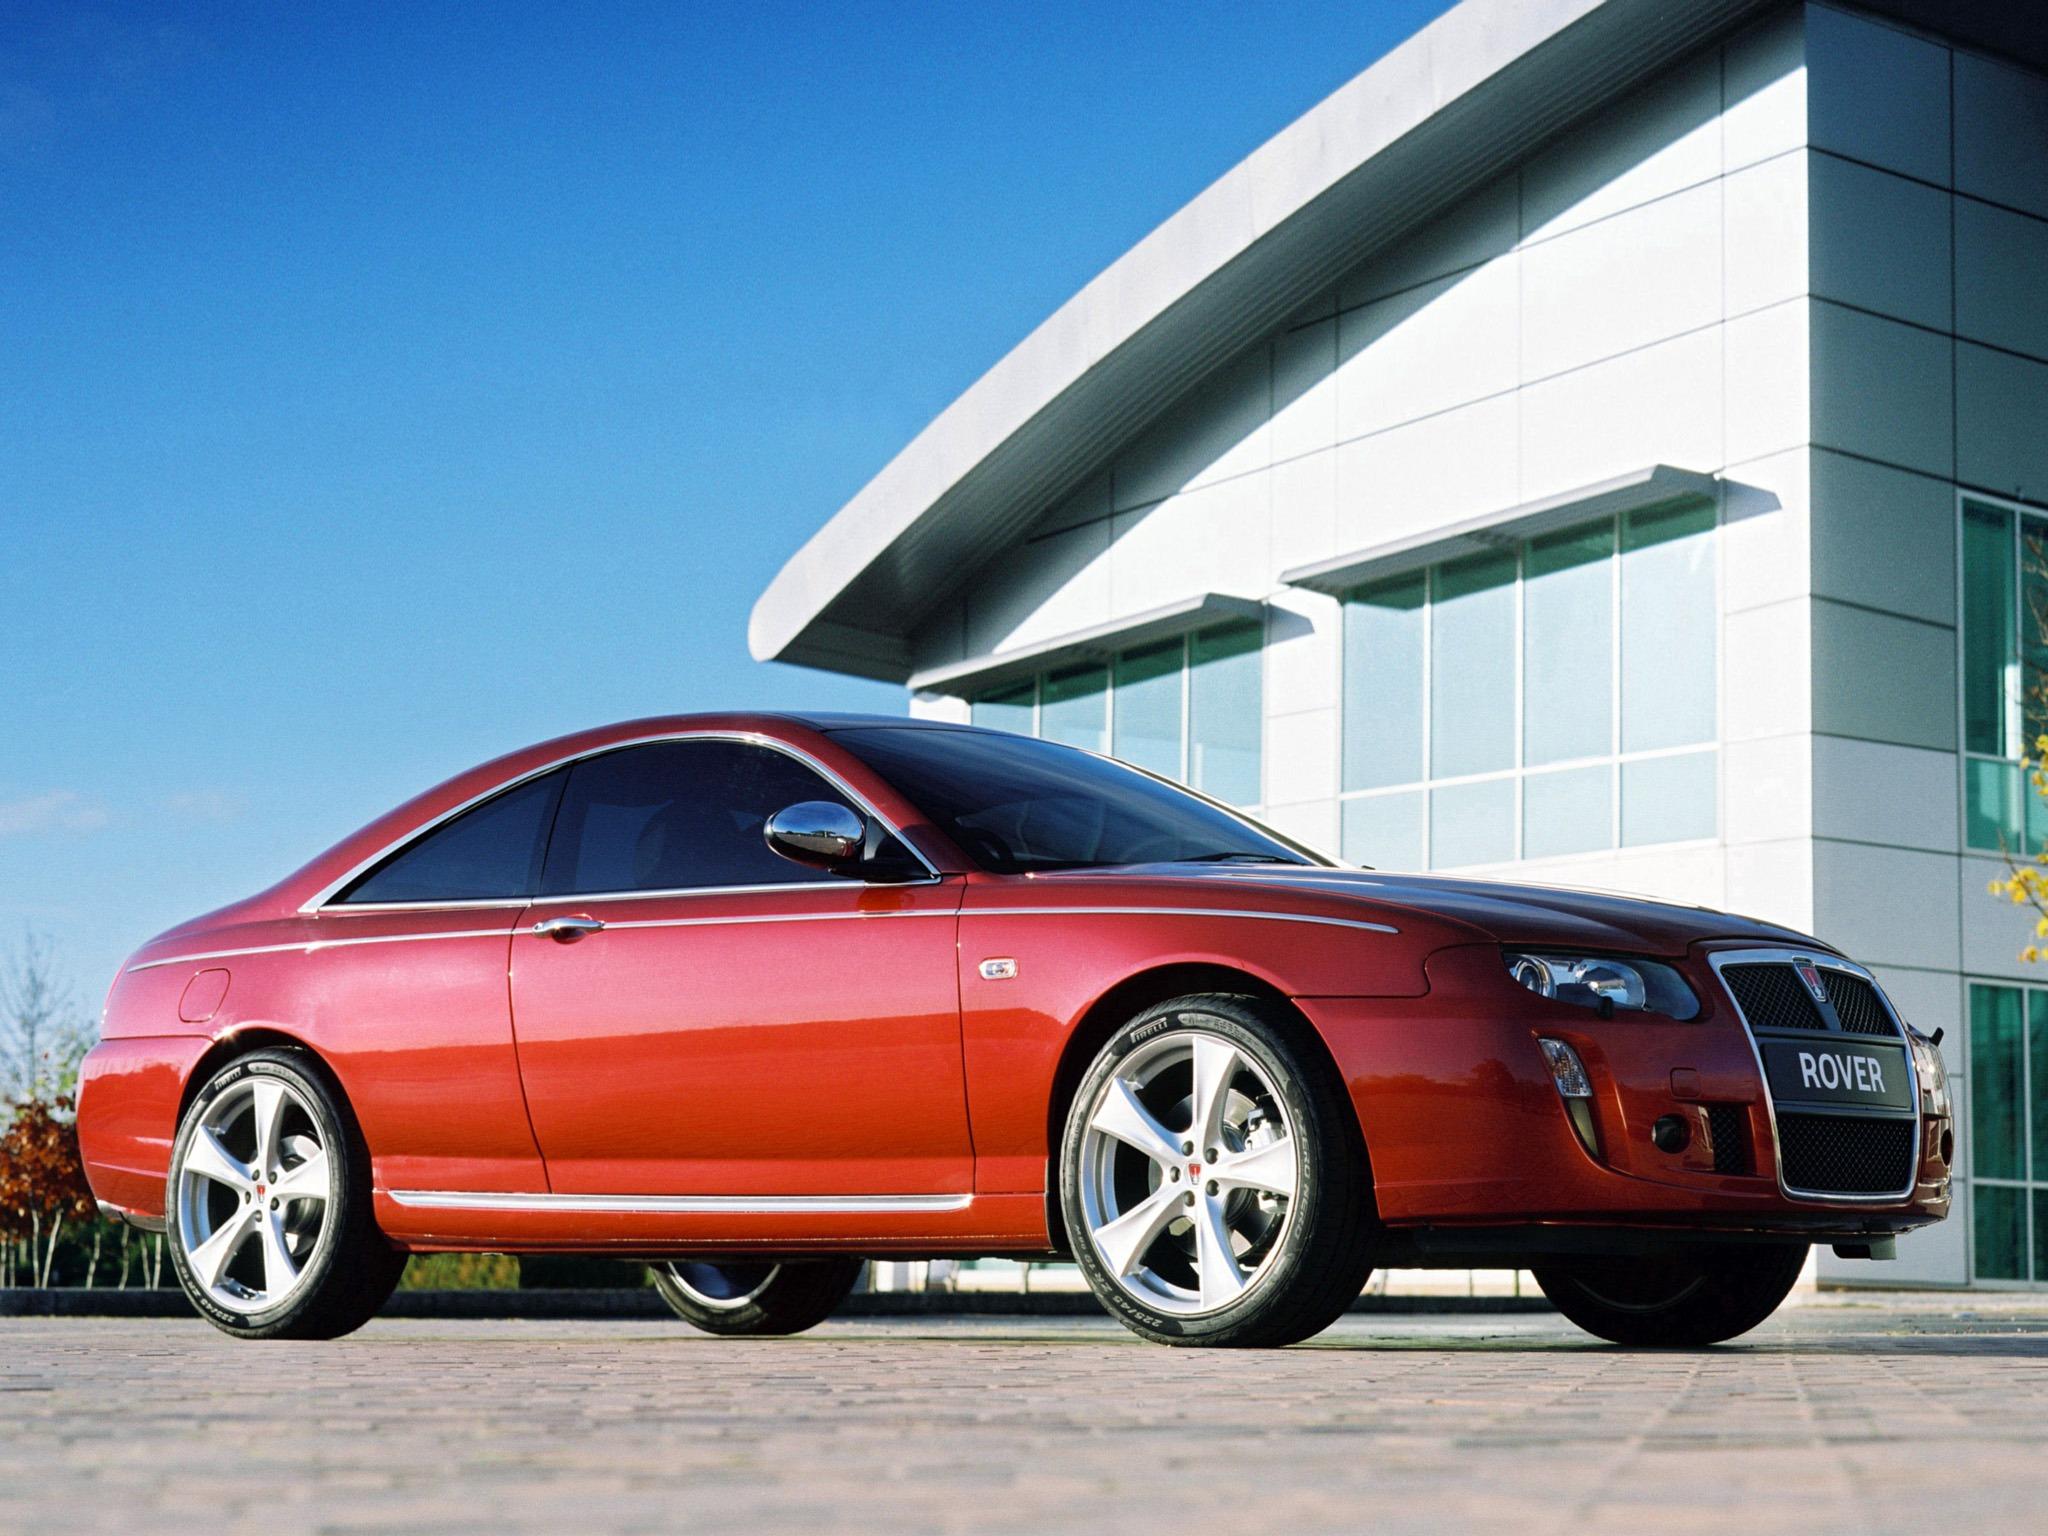 Subaru Near Me >> Rover 75 Coupe Concept (2004) - Old Concept Cars